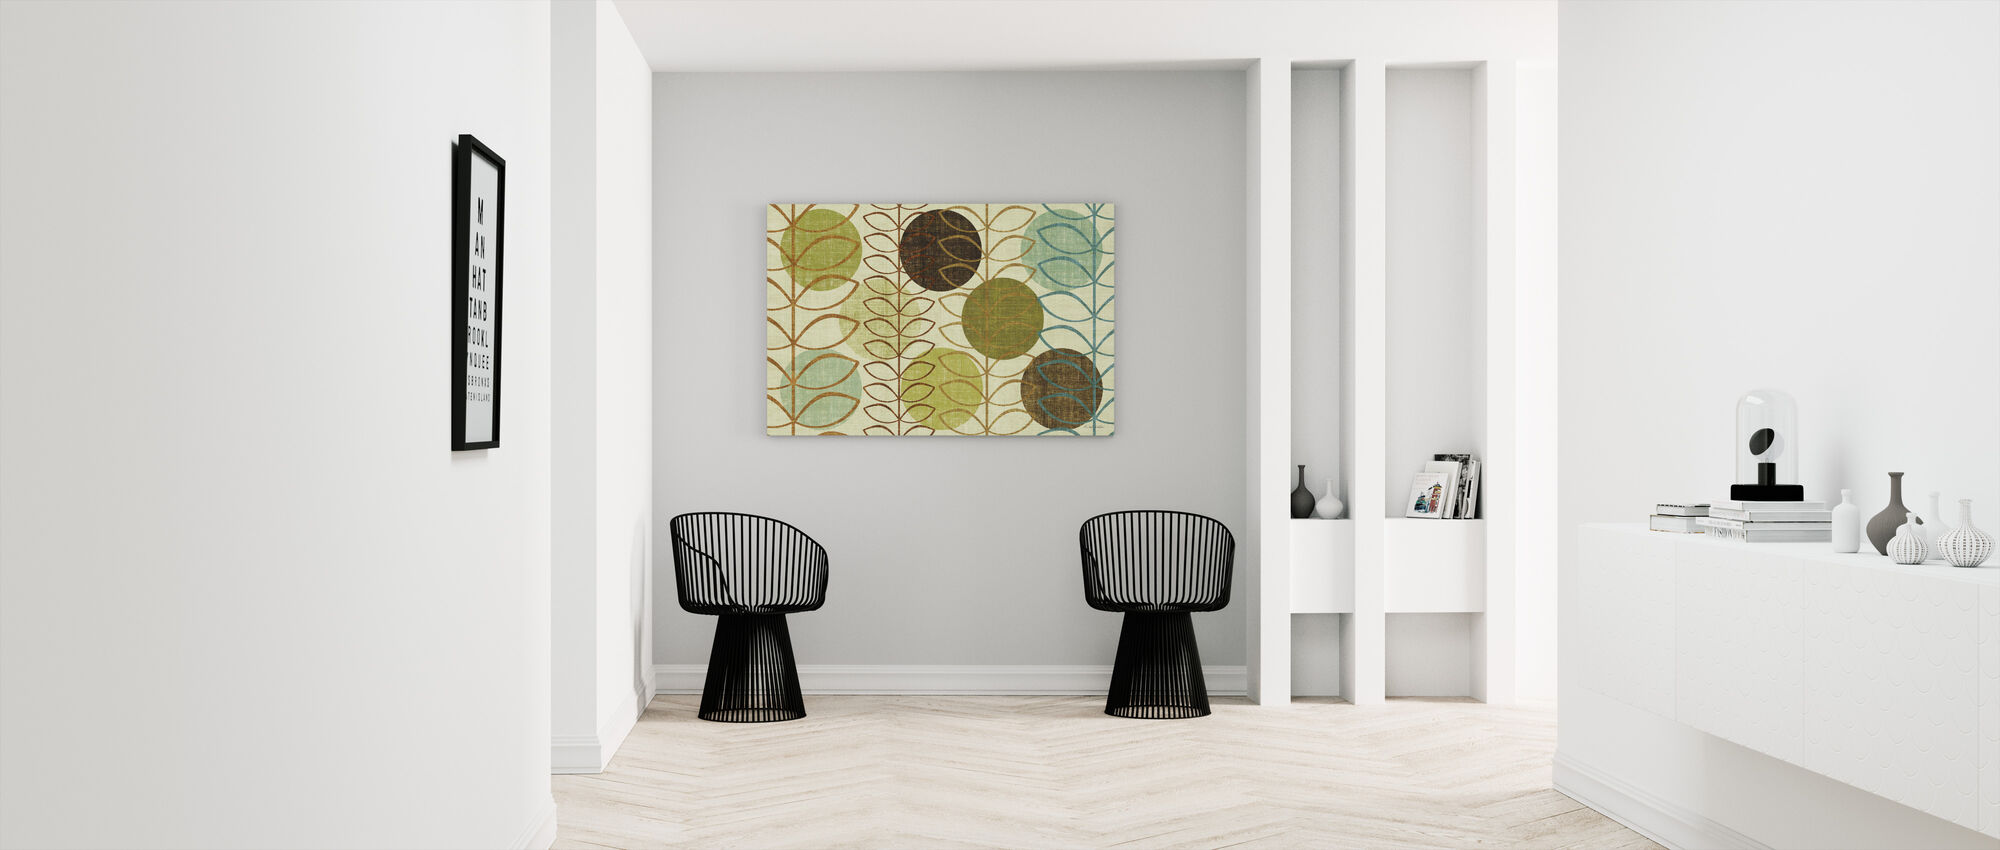 Moderni varret - Canvastaulu - Aula